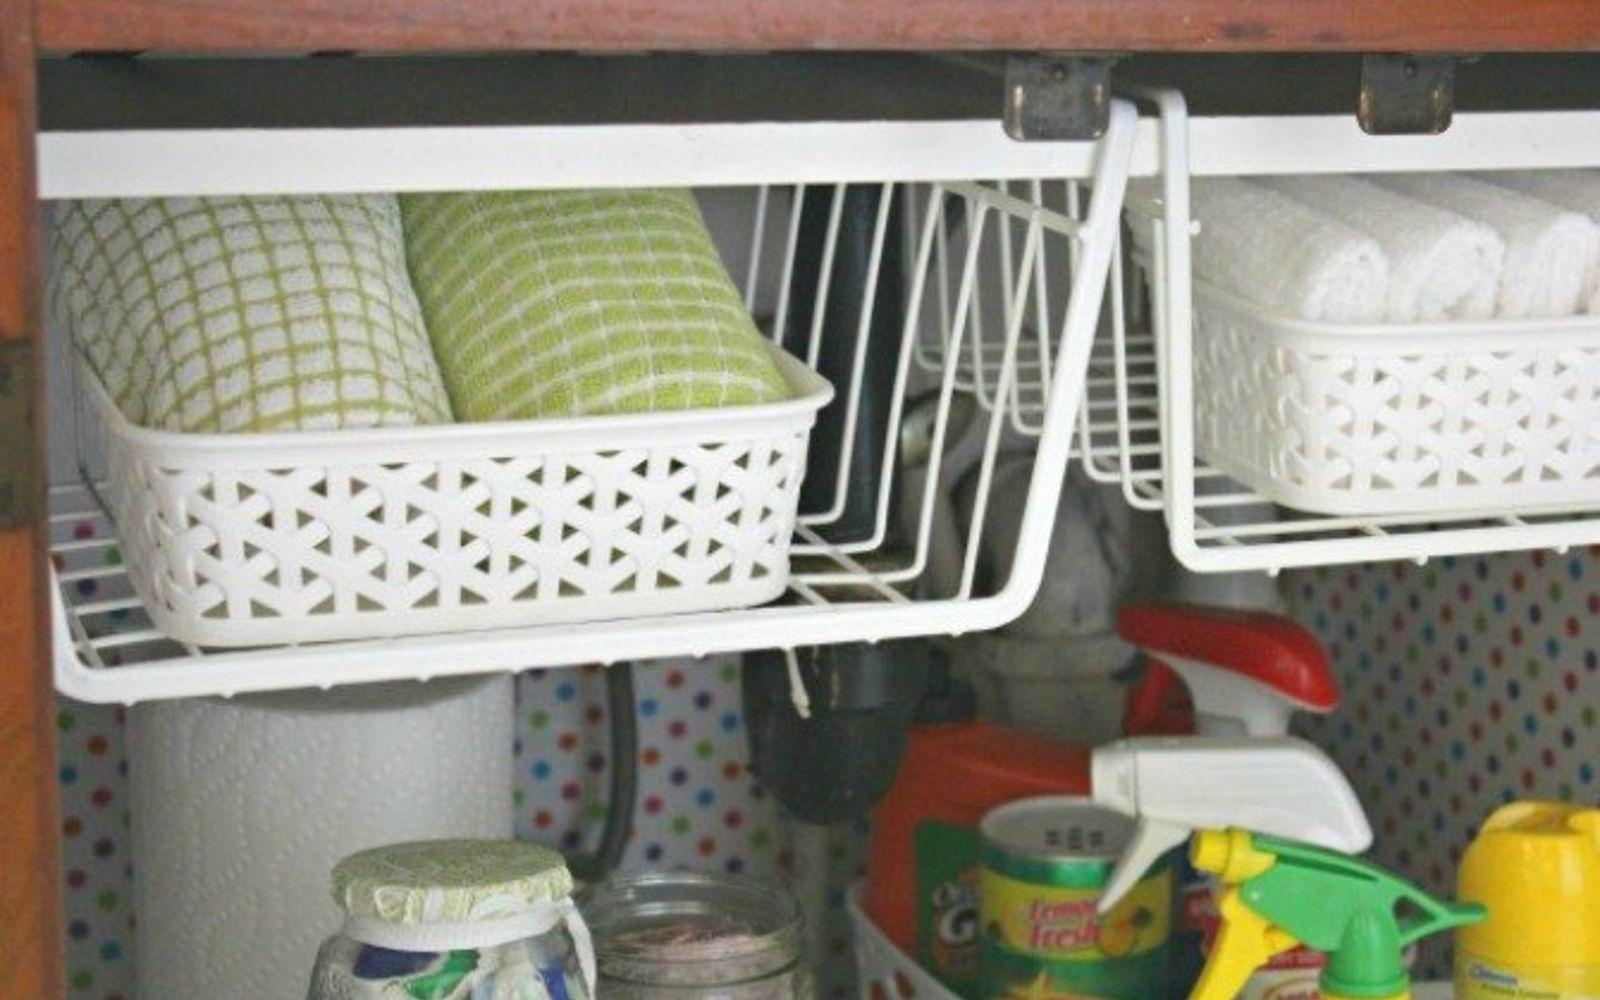 Kitchen Sink Organizer Ideas how to keep dirty kitchen spots clean and fresh much longer   hometalk